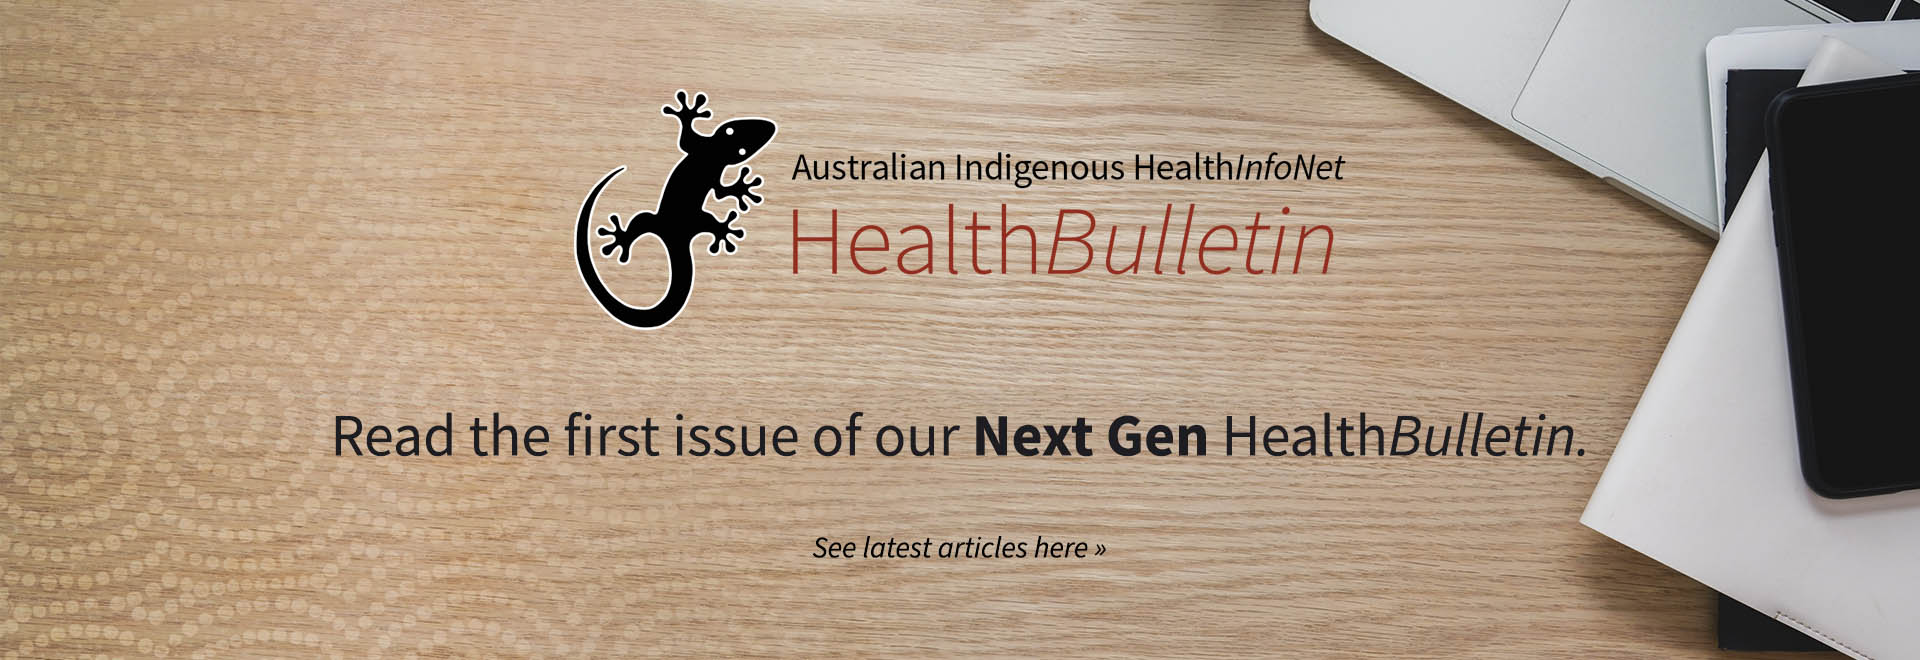 healthBulletin - NextGen